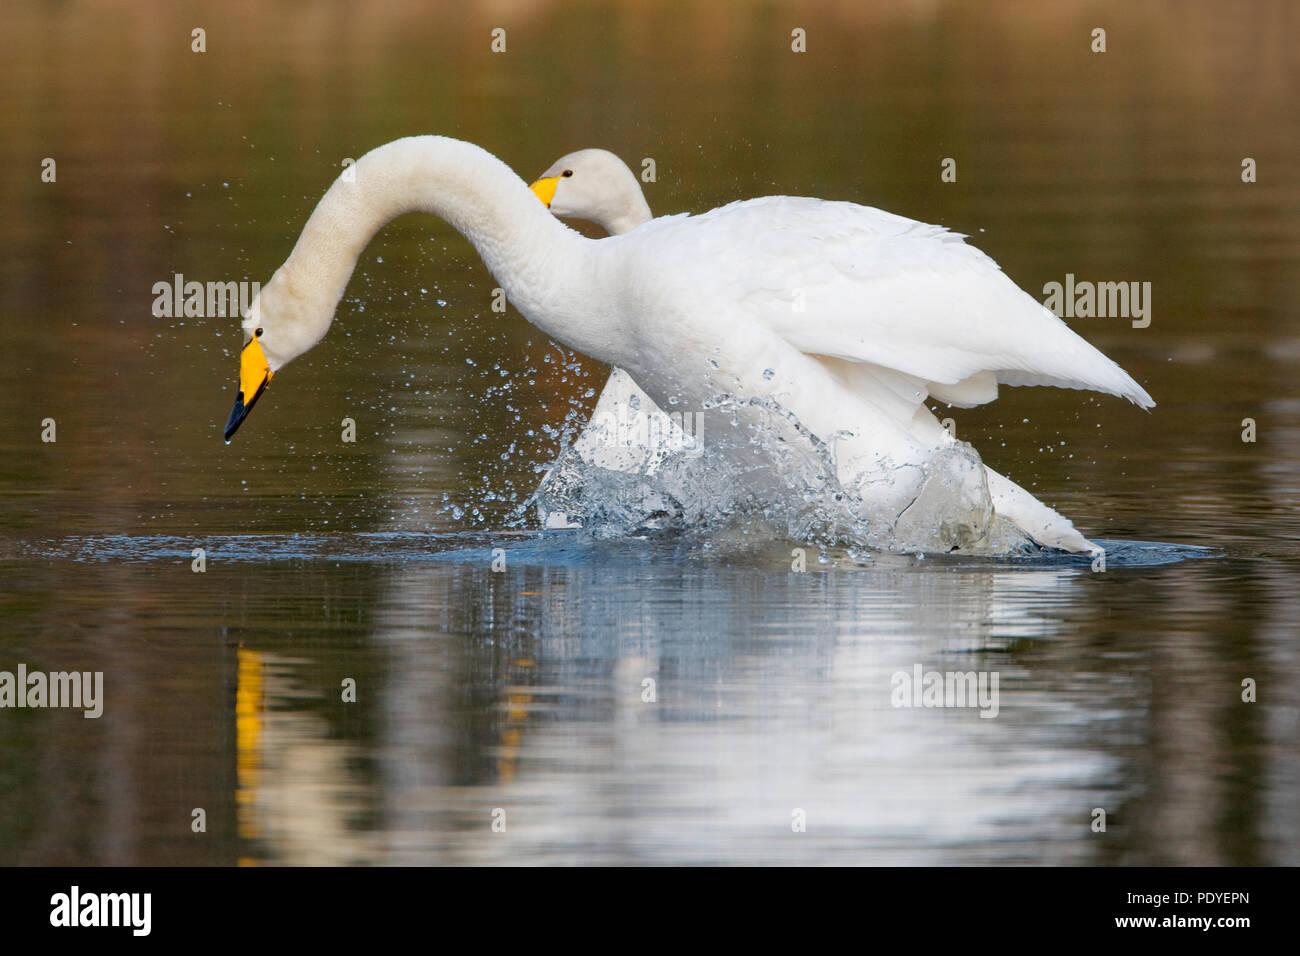 Twee wilde zwanen met klapperende vleugels.Two Whooper Swans with flapping wings. Stock Photo